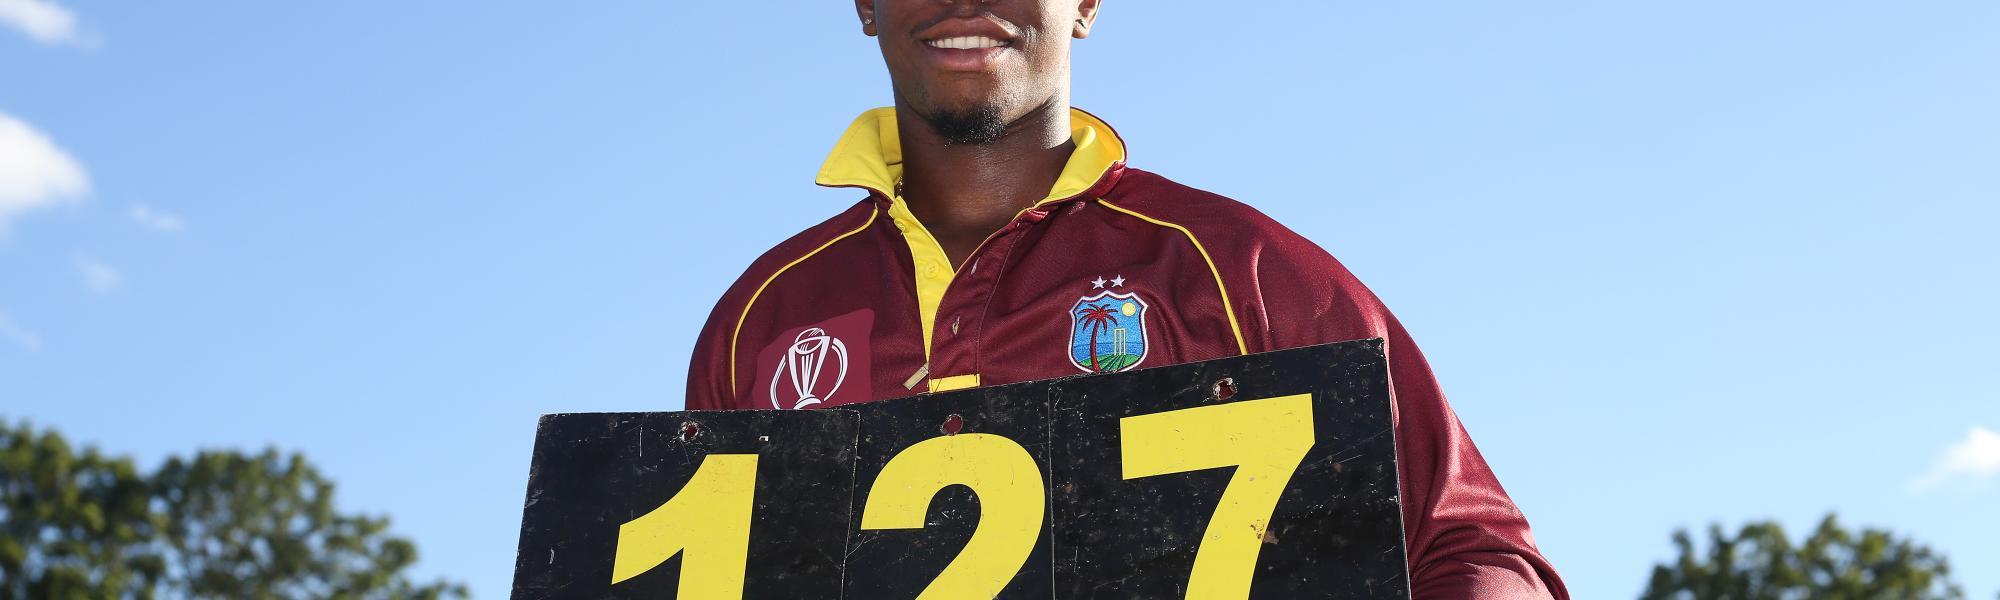 Shimron Hetmyer maiden ODI century